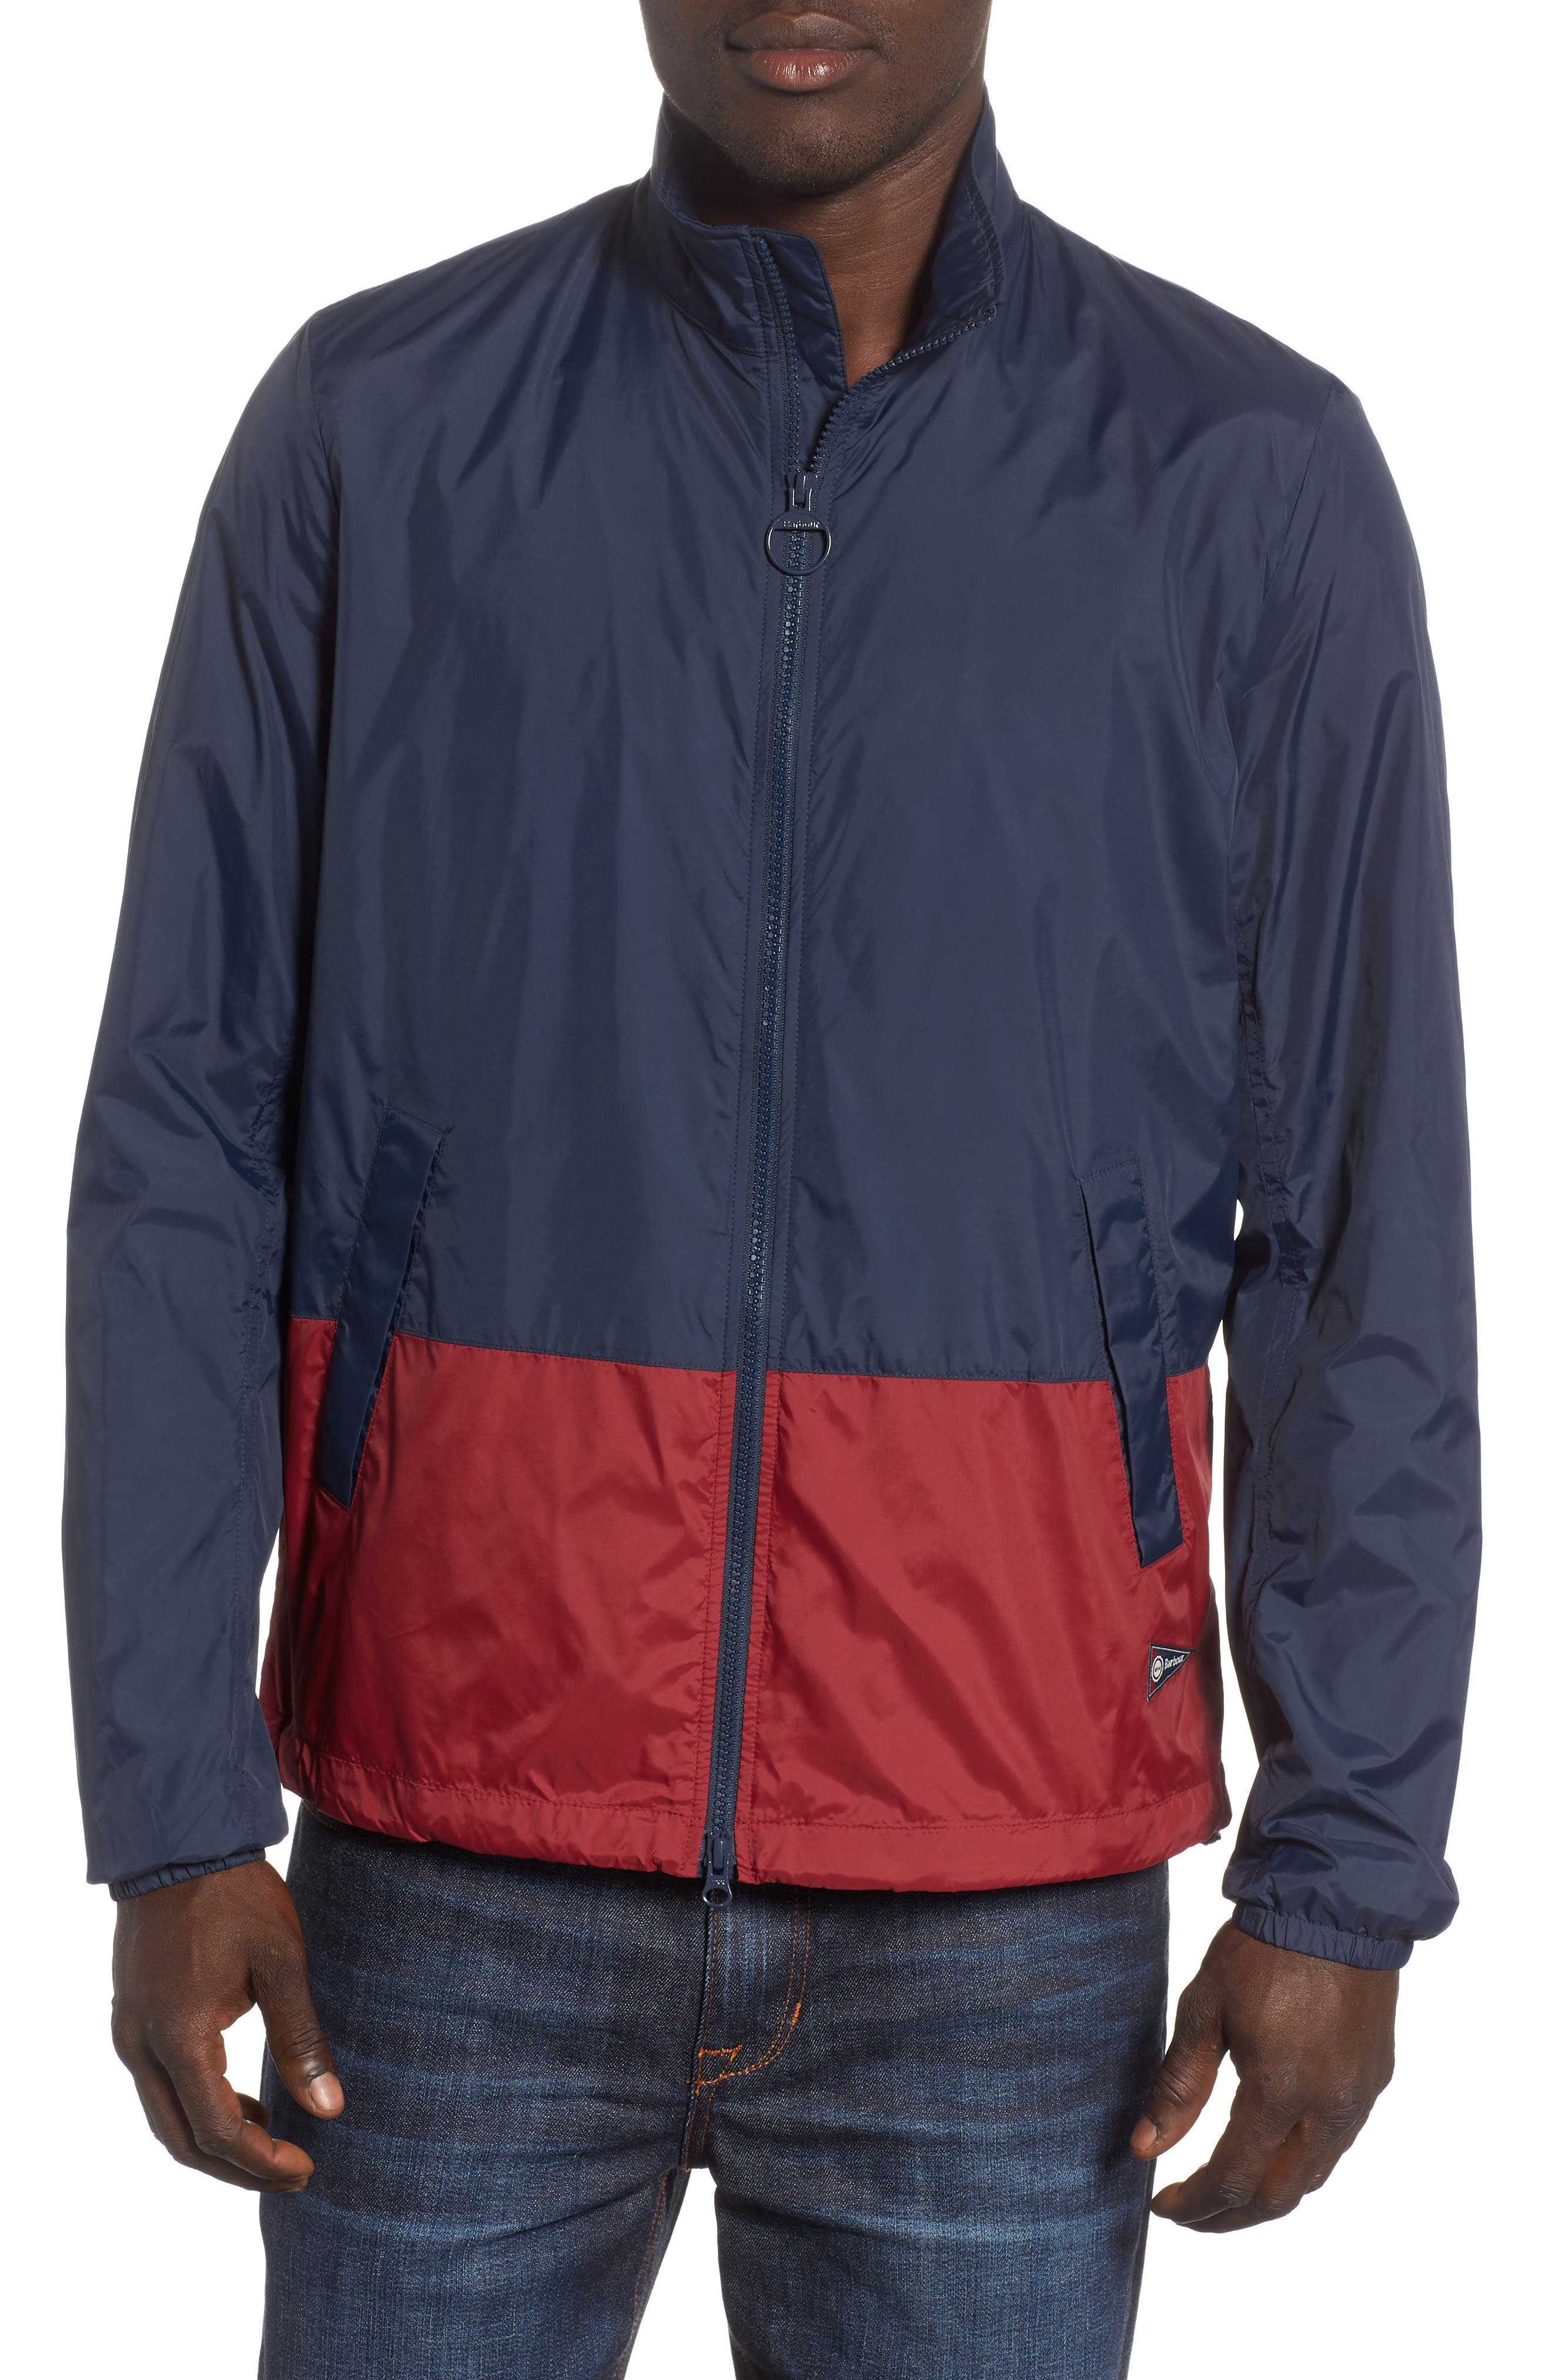 Bollen Jacket,                             Main thumbnail 1, color,                             Navy